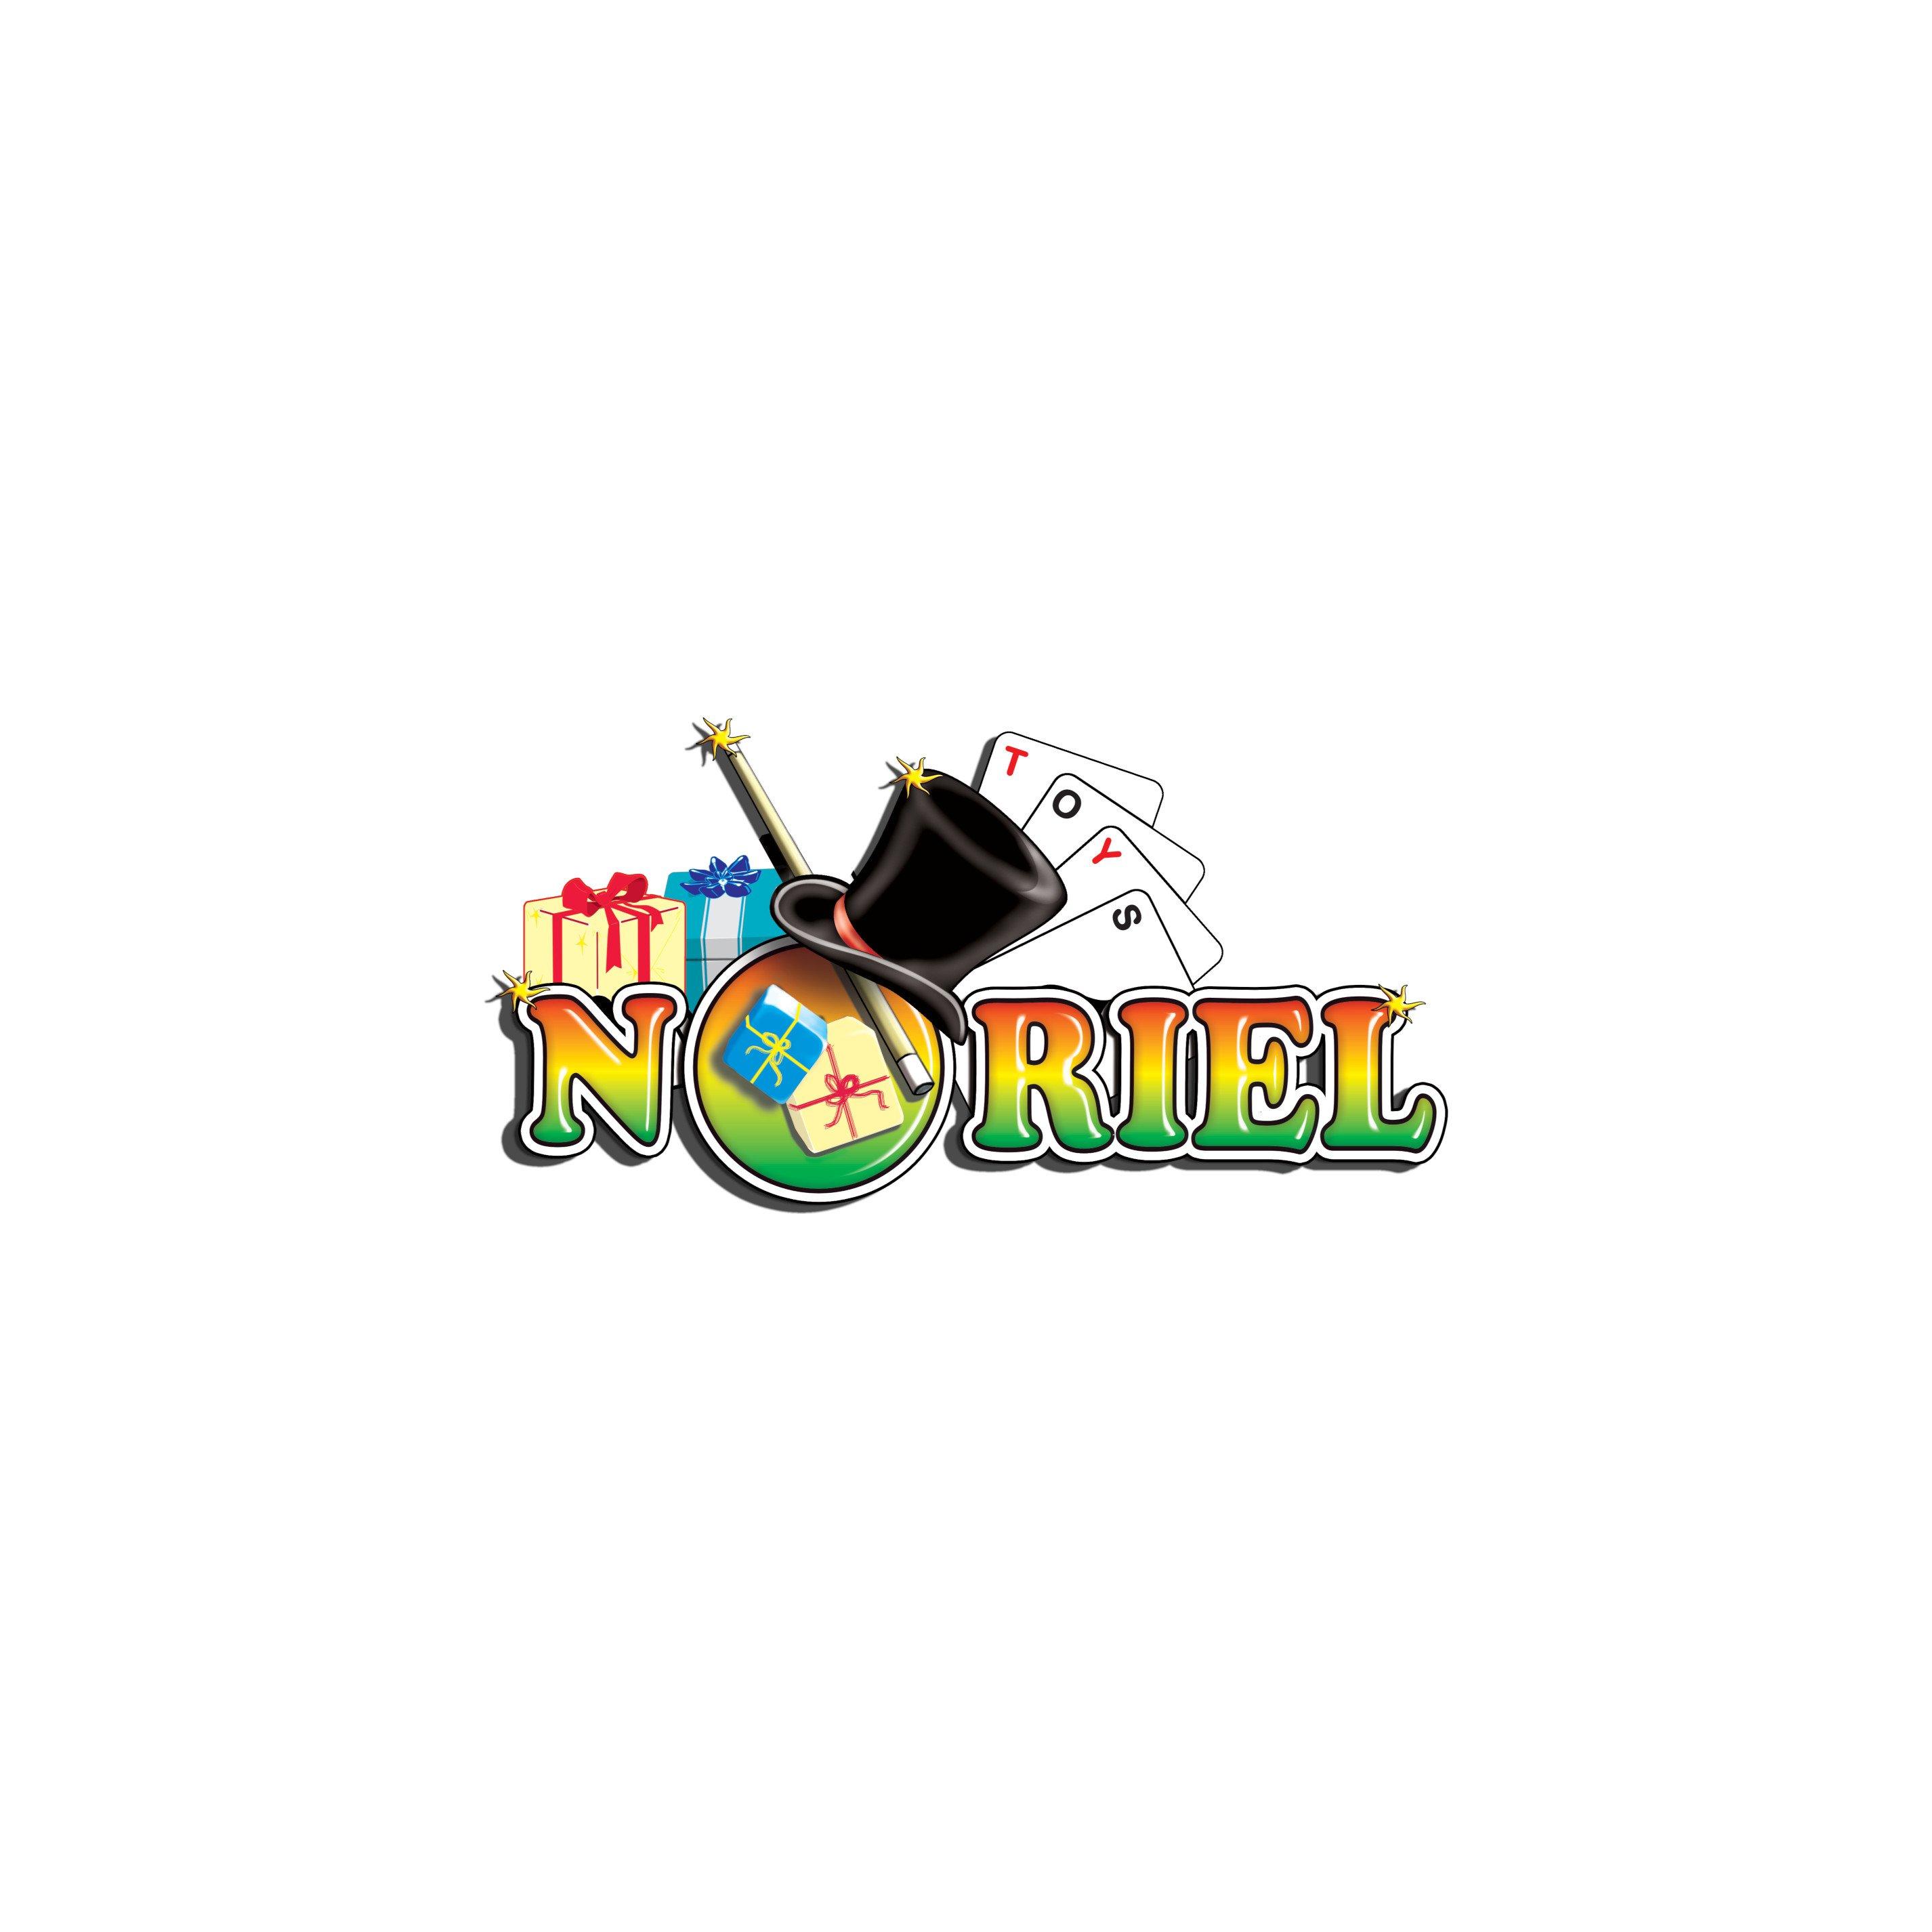 LG75967_001w LEGO® Harry Potter™ - Padurea interzisa intalnirea dintre Grawp si Umbridge